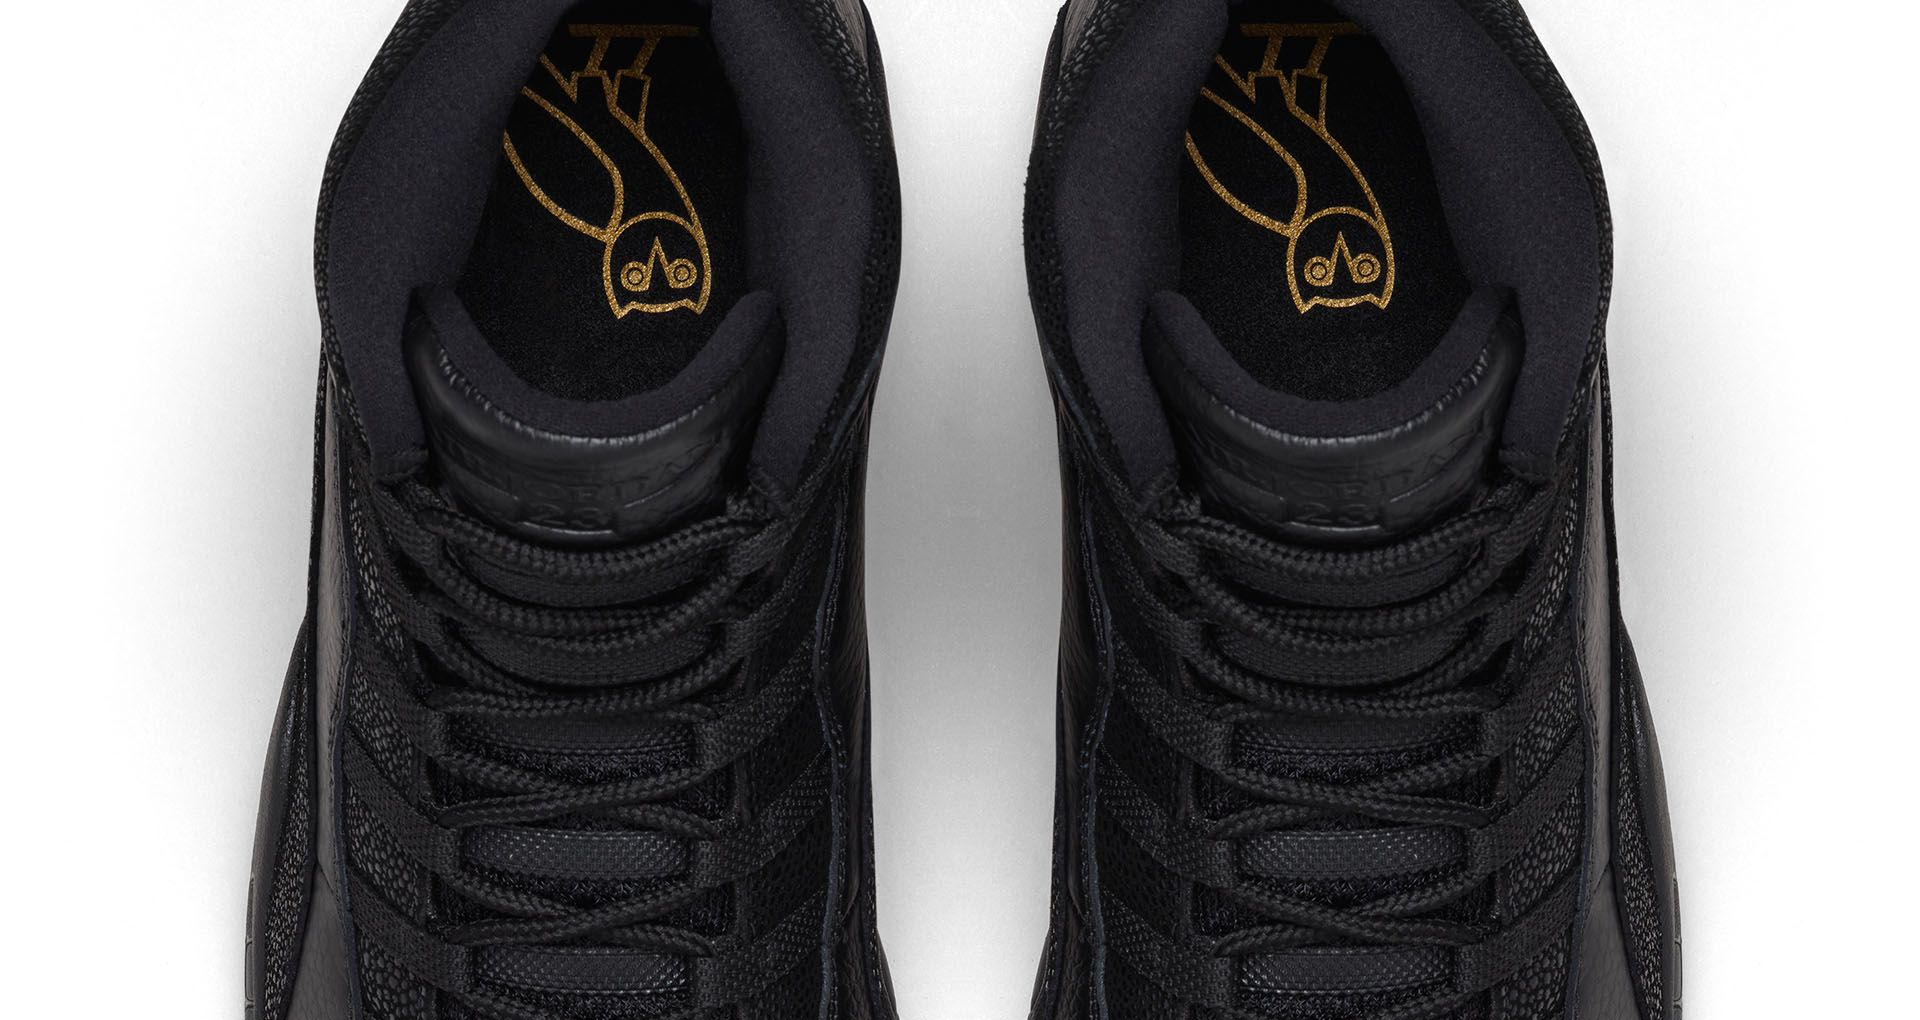 c3a6e26002eae Air Jordan 10 Retro  OVO   Black  Release Date. Nike+ SNKRS